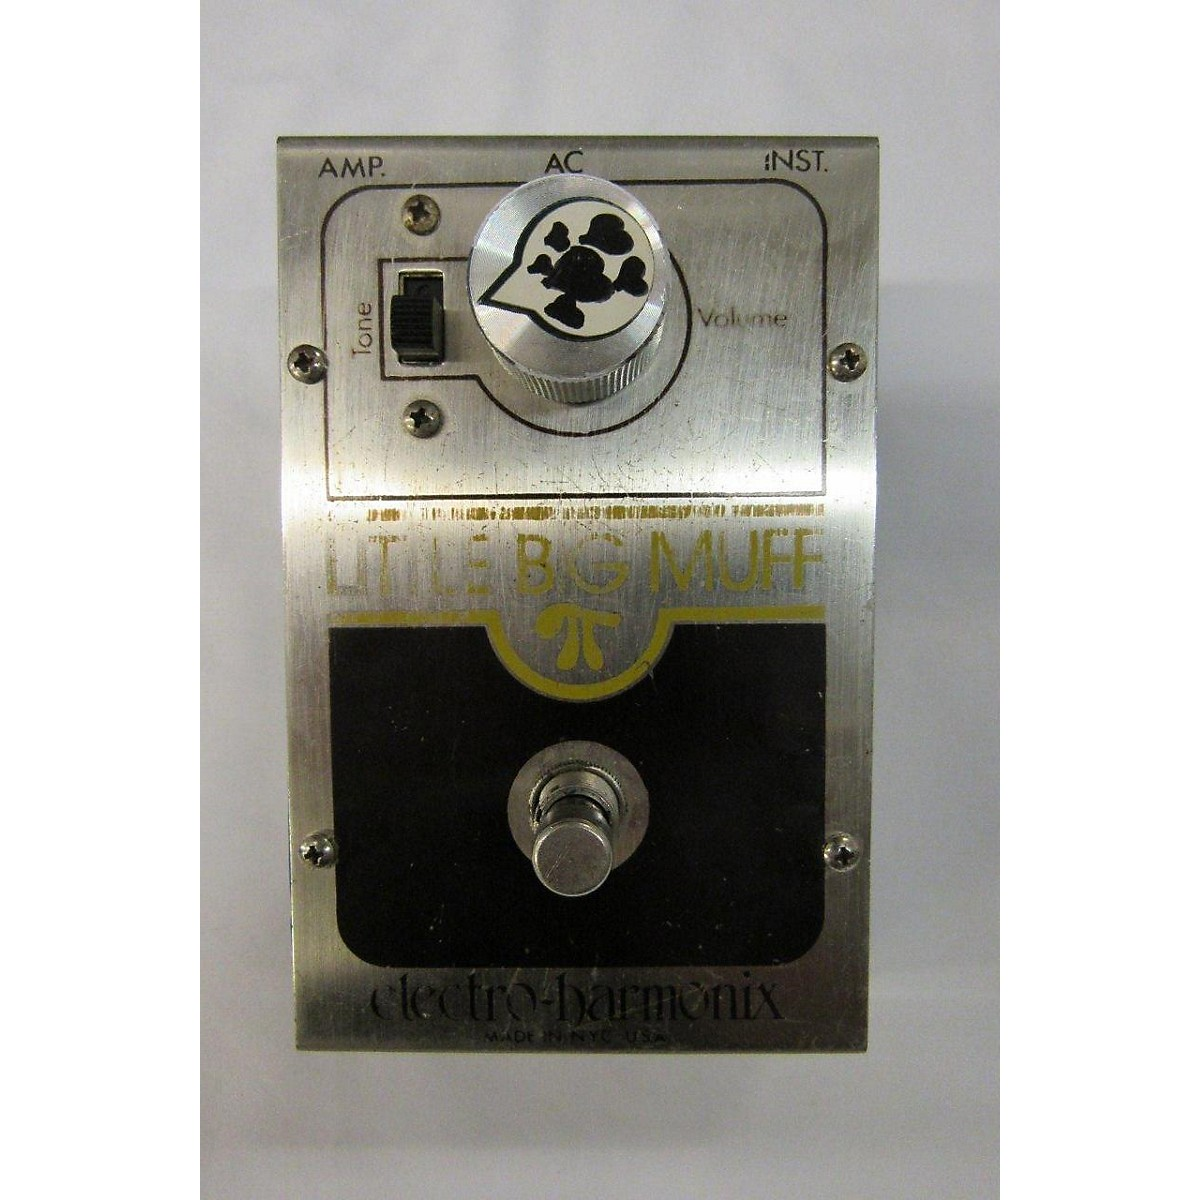 Electro-Harmonix 1981 Little Big Muff Distortion Effect Pedal